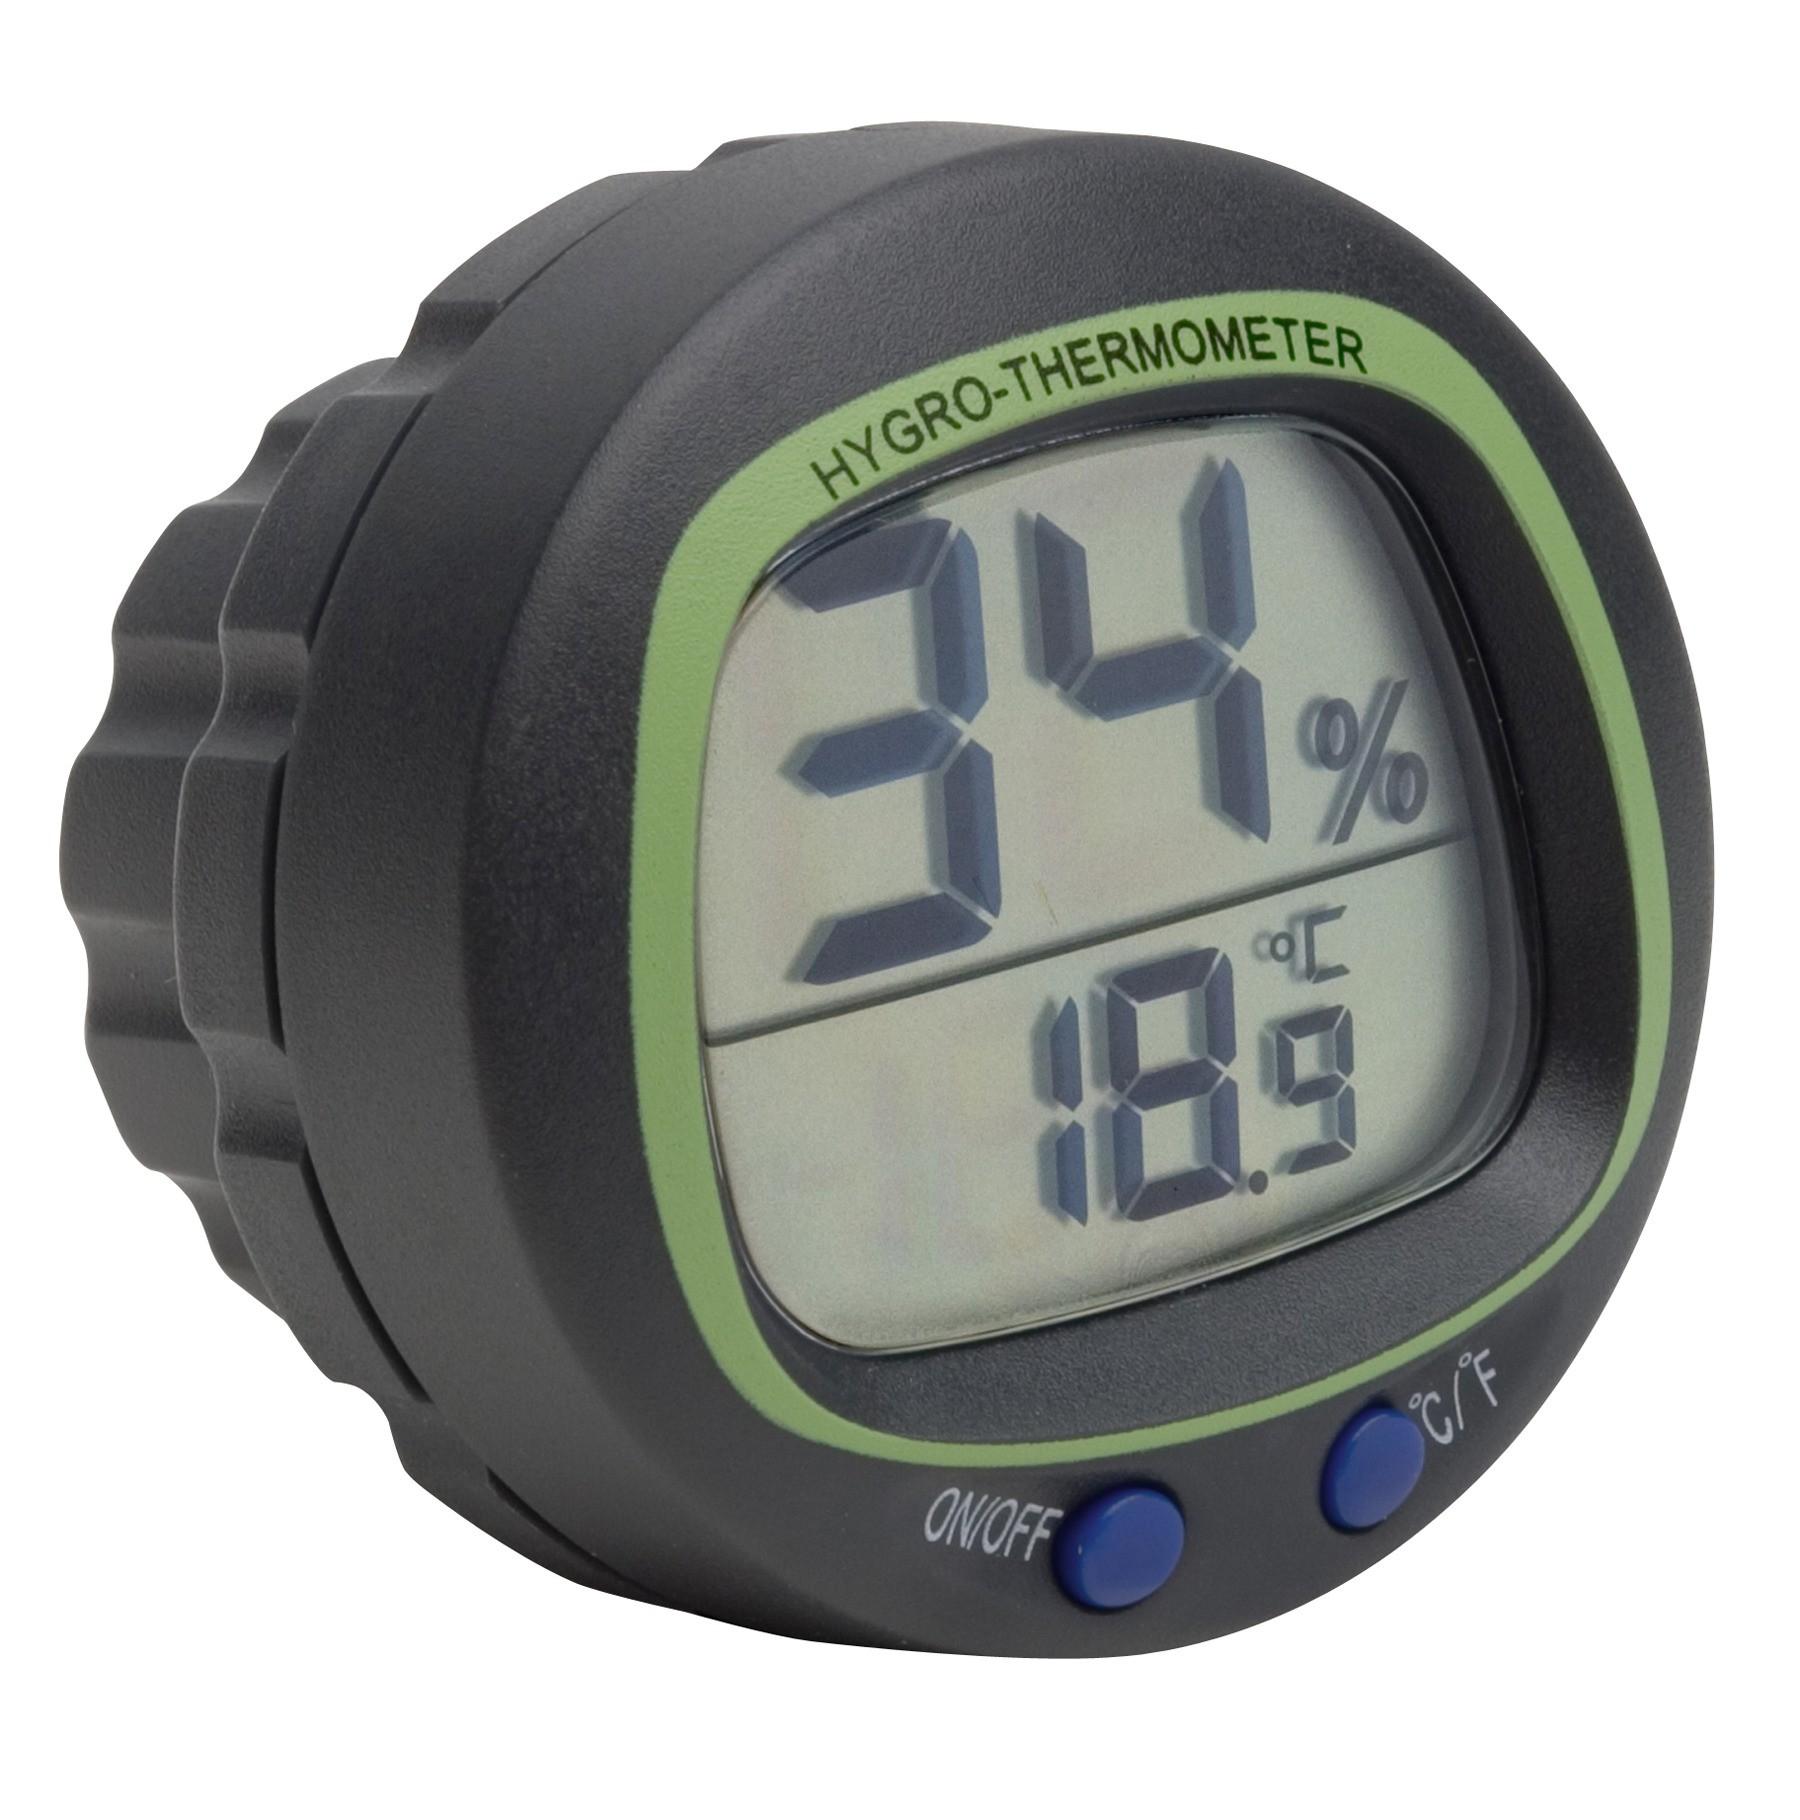 H-B DURAC Electronic Thermometer-Hygrometer, Panel Mount